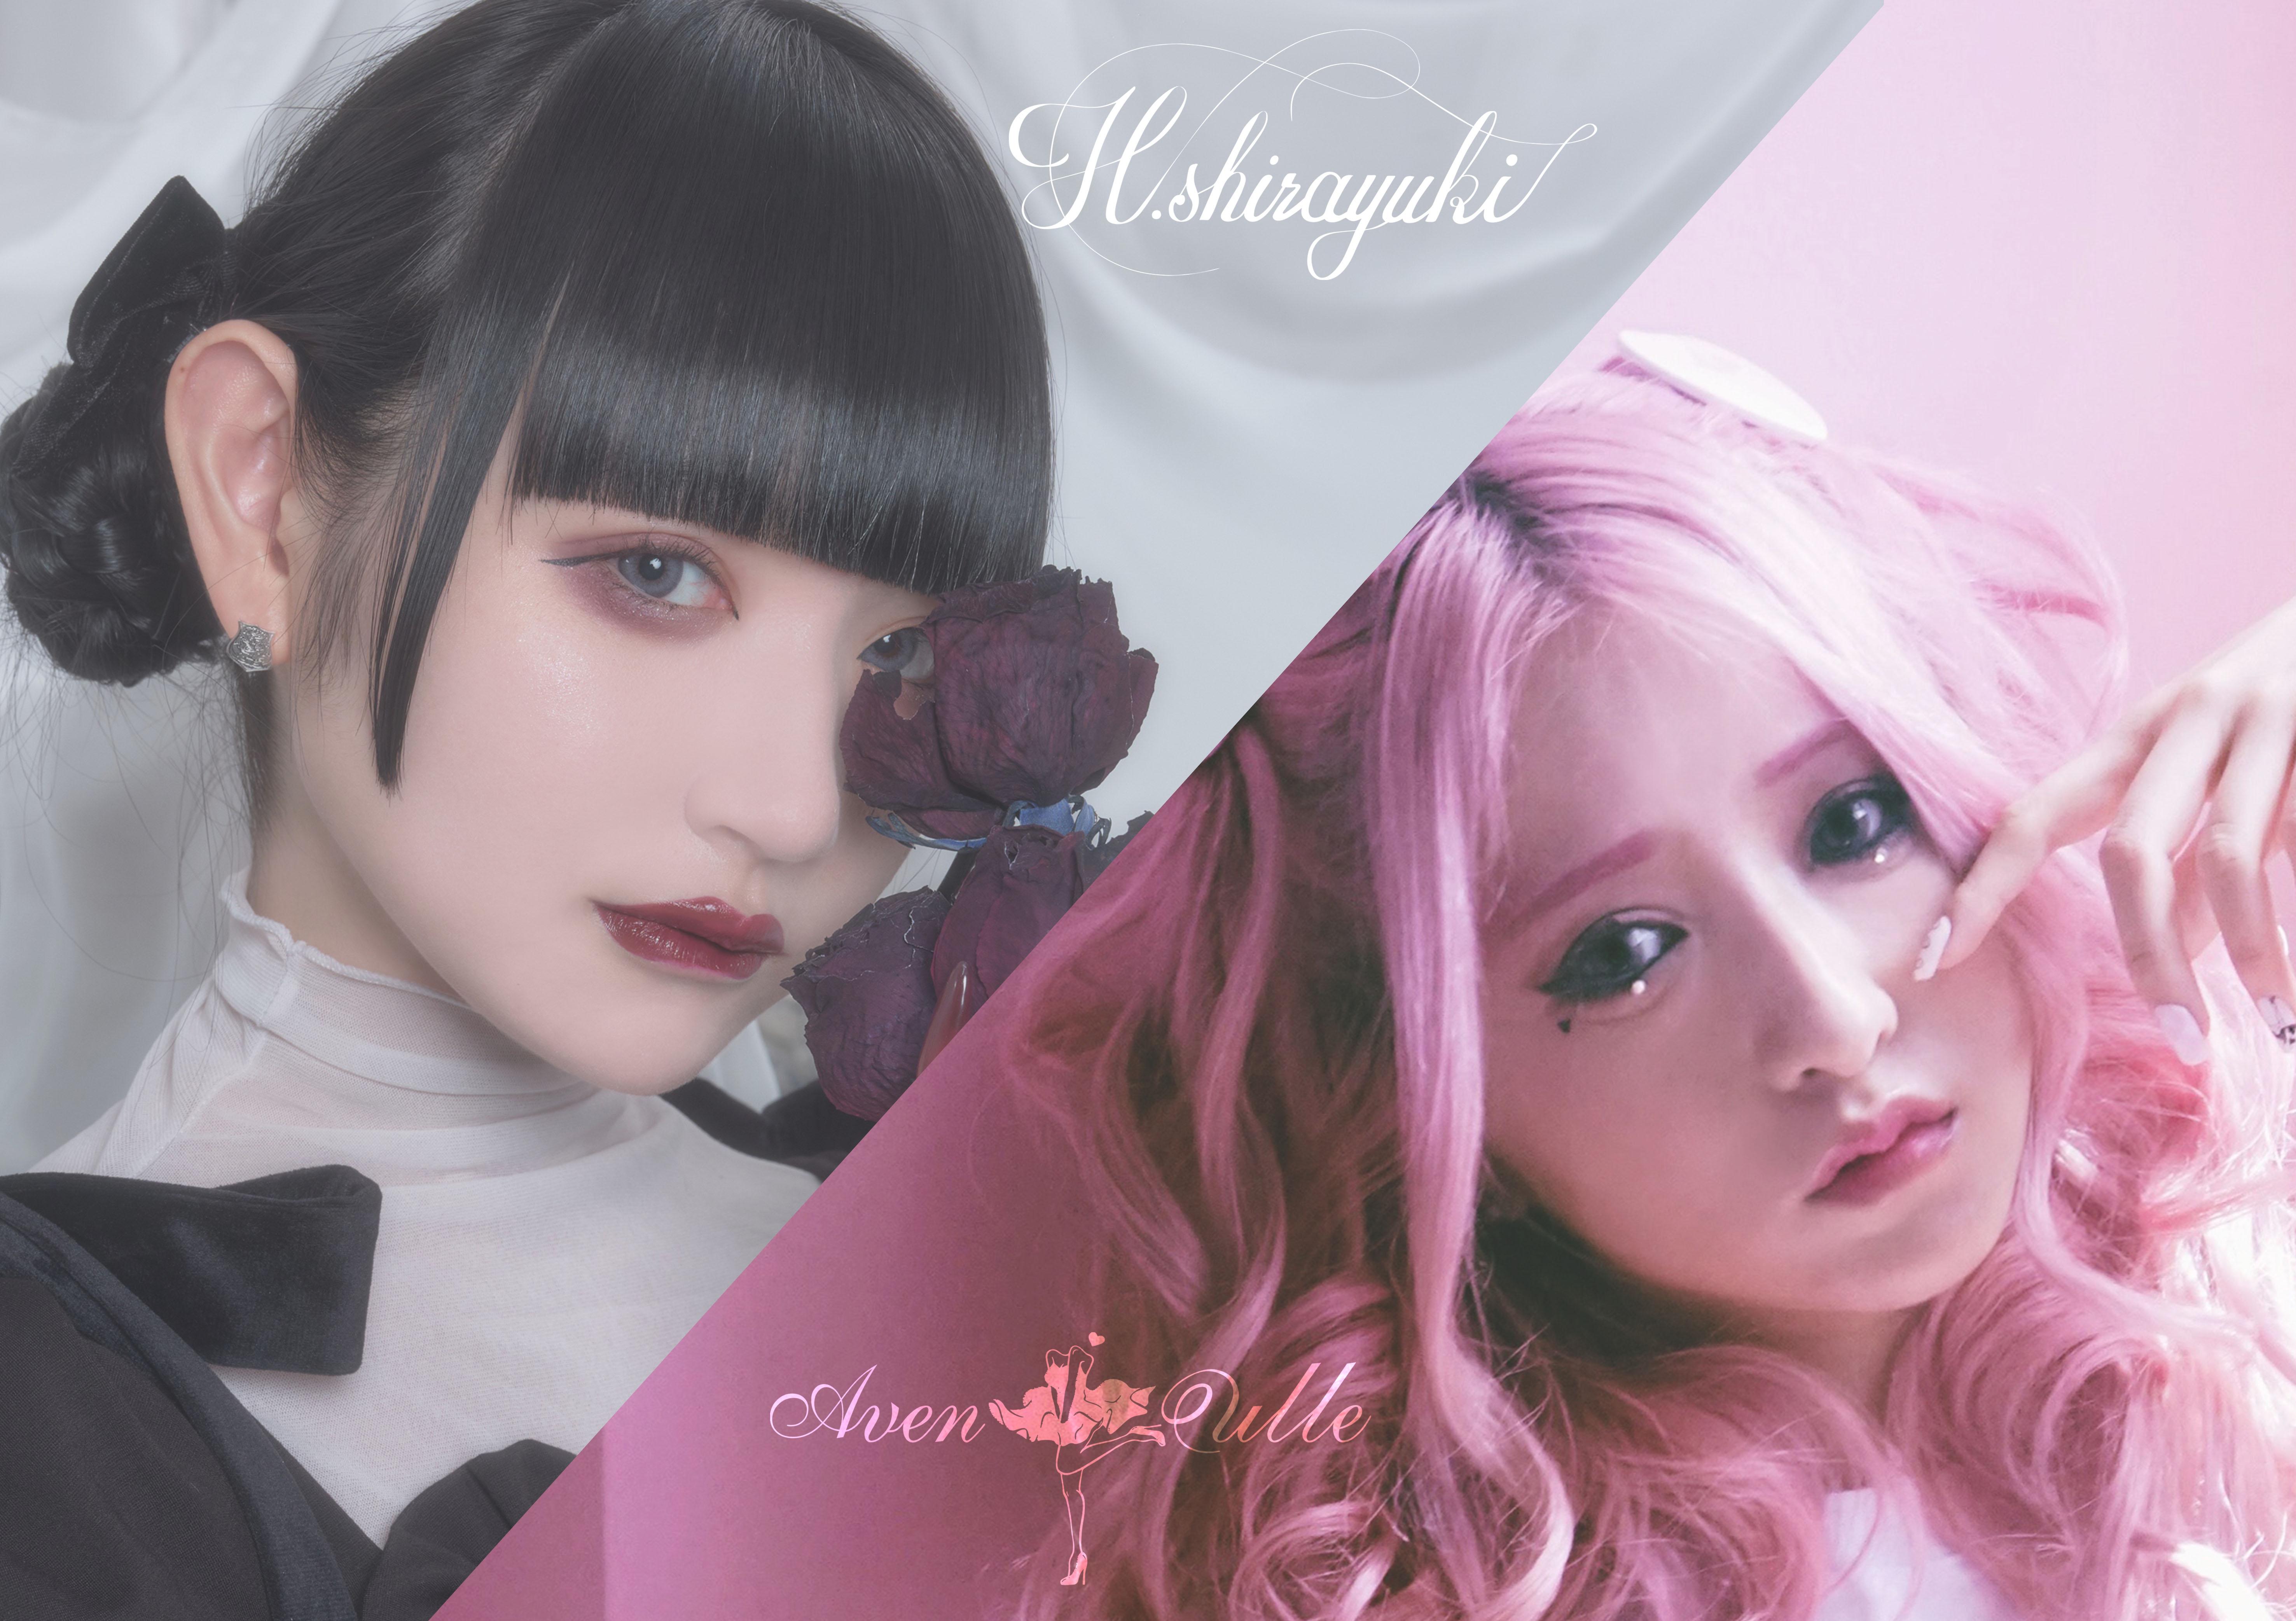 【6月4日入場分】h.shirayuki/Aventulle POPUPSTORE